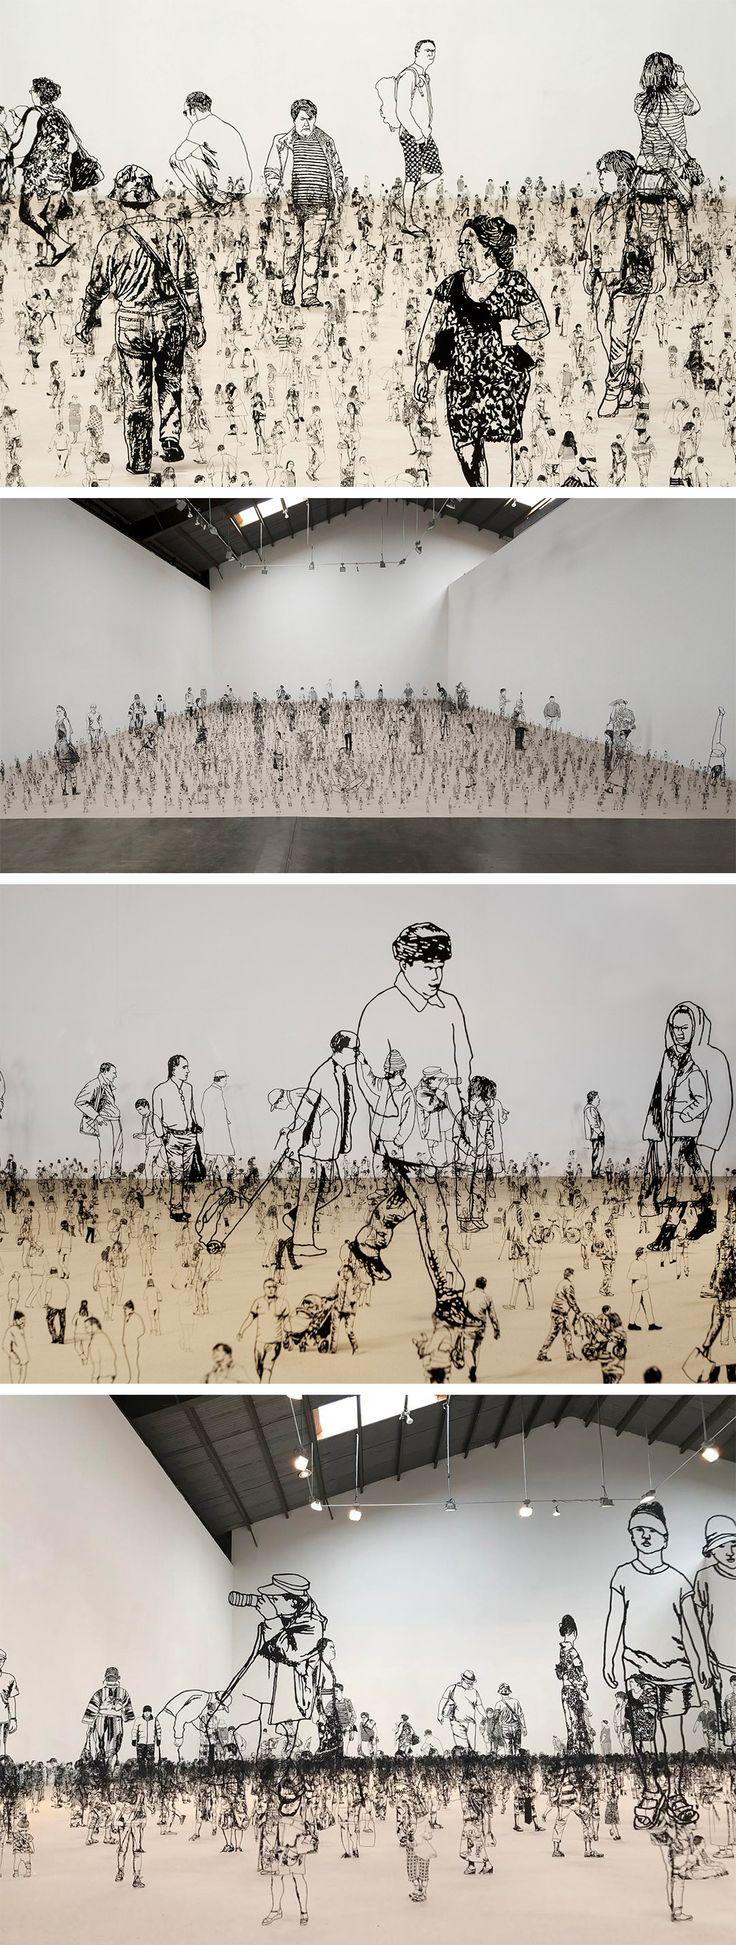 People I Saw But Never Met: Thousands of Miniature Metal Figurines by Zadok Ben-David